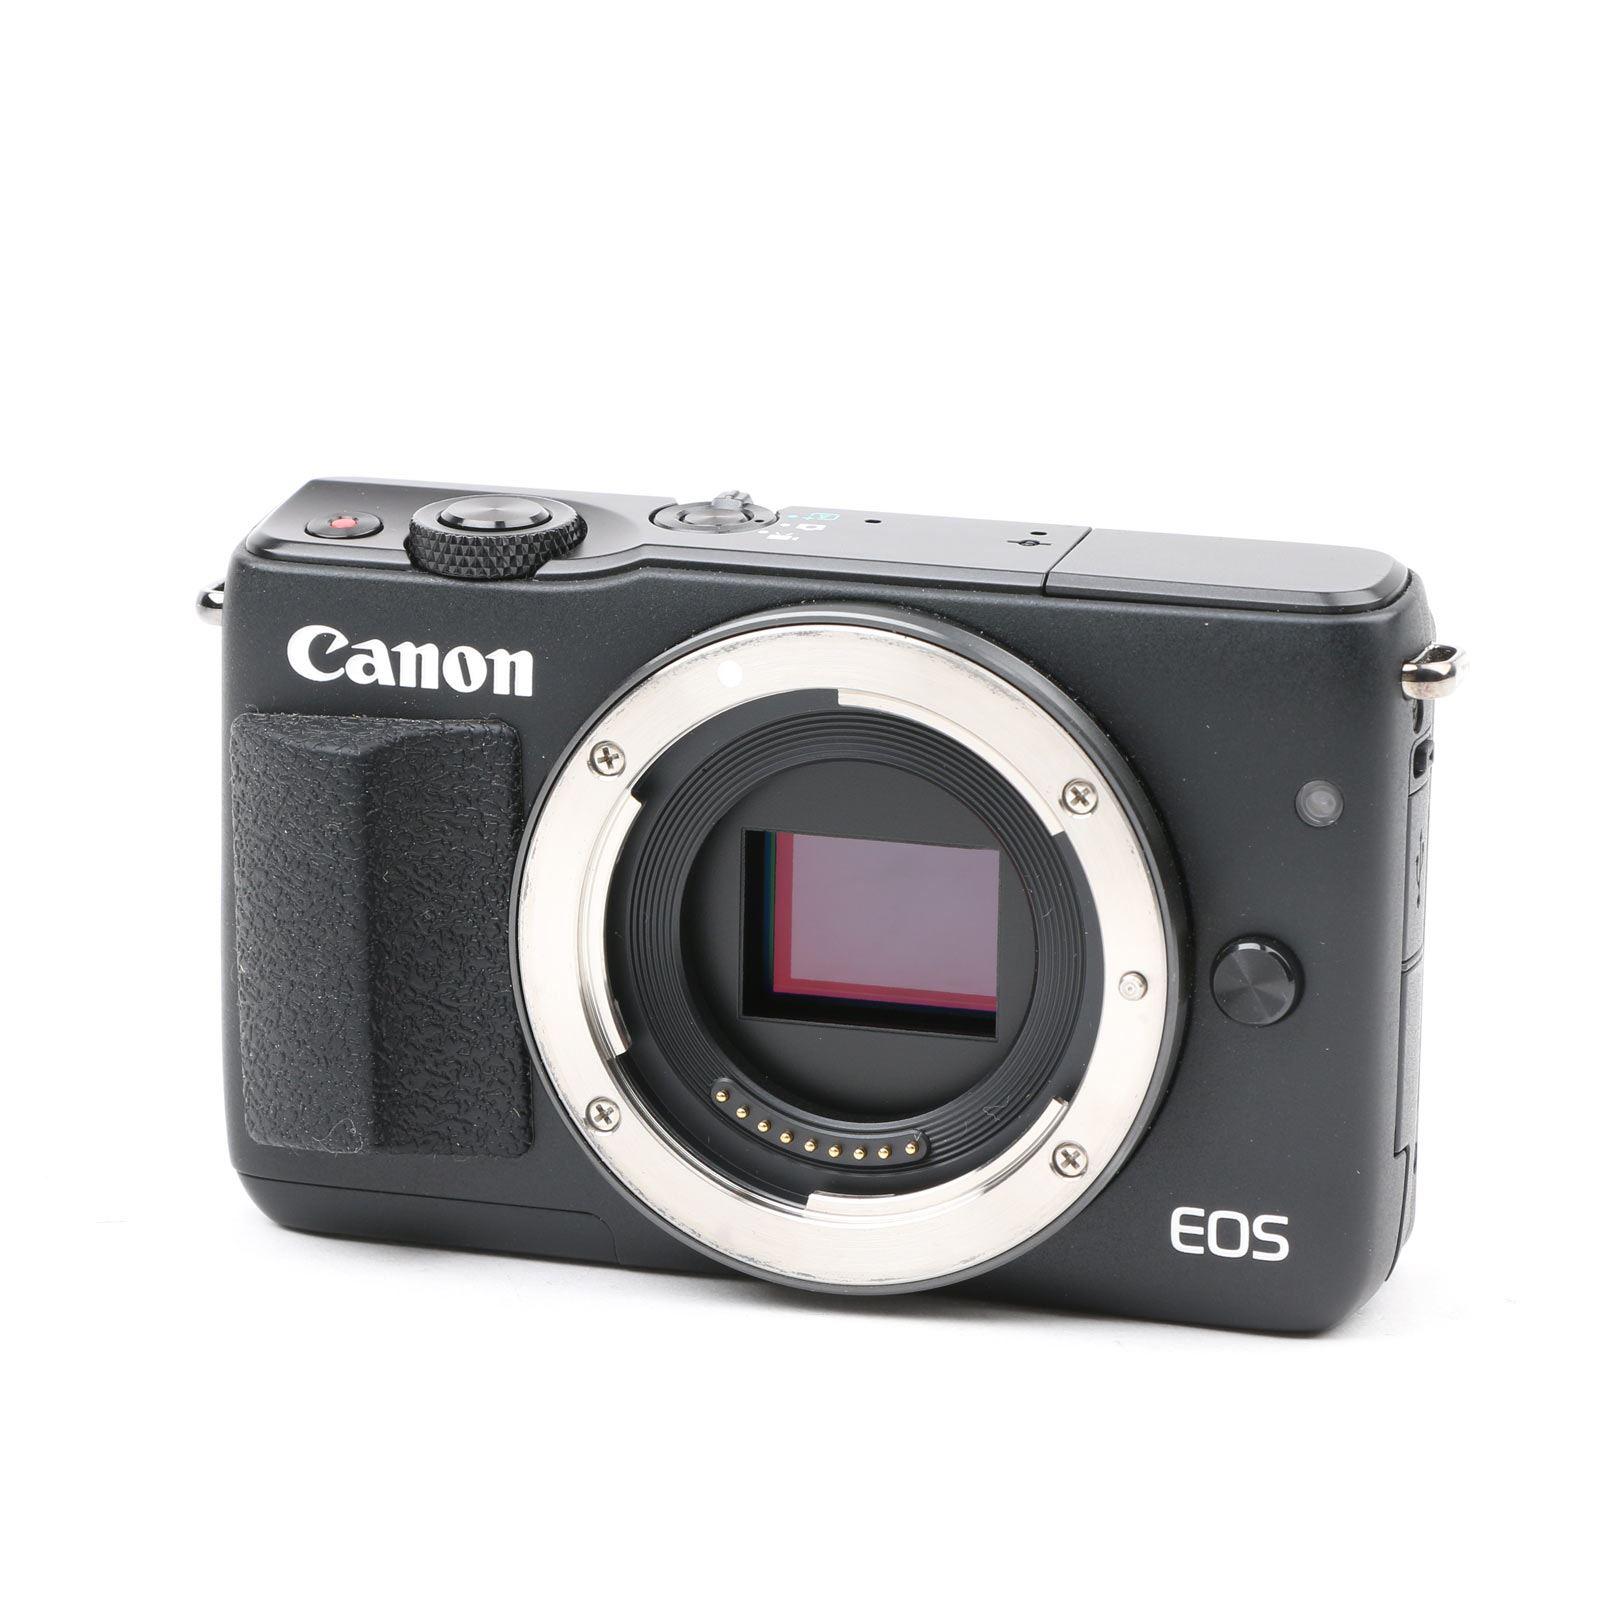 Image of Used Canon EOS M10 Digital Camera Body - Black